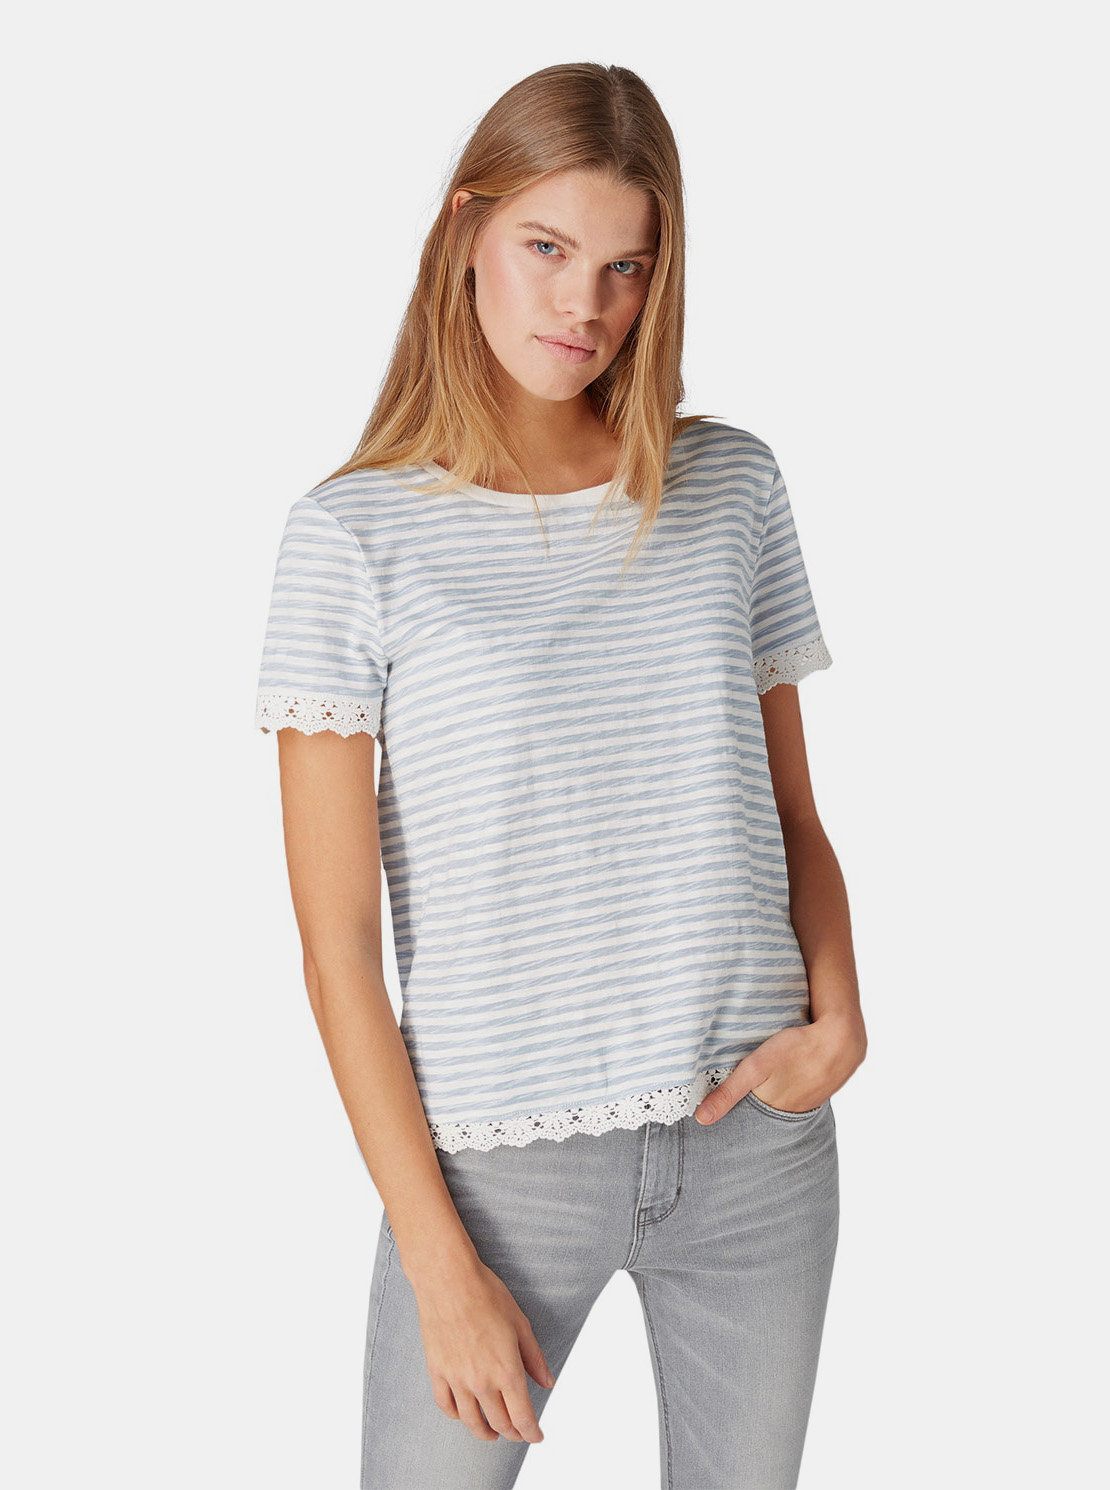 805f80003991 Modro–biele dámske pruhované tričko s čipkou Tom Tailor Denim ...